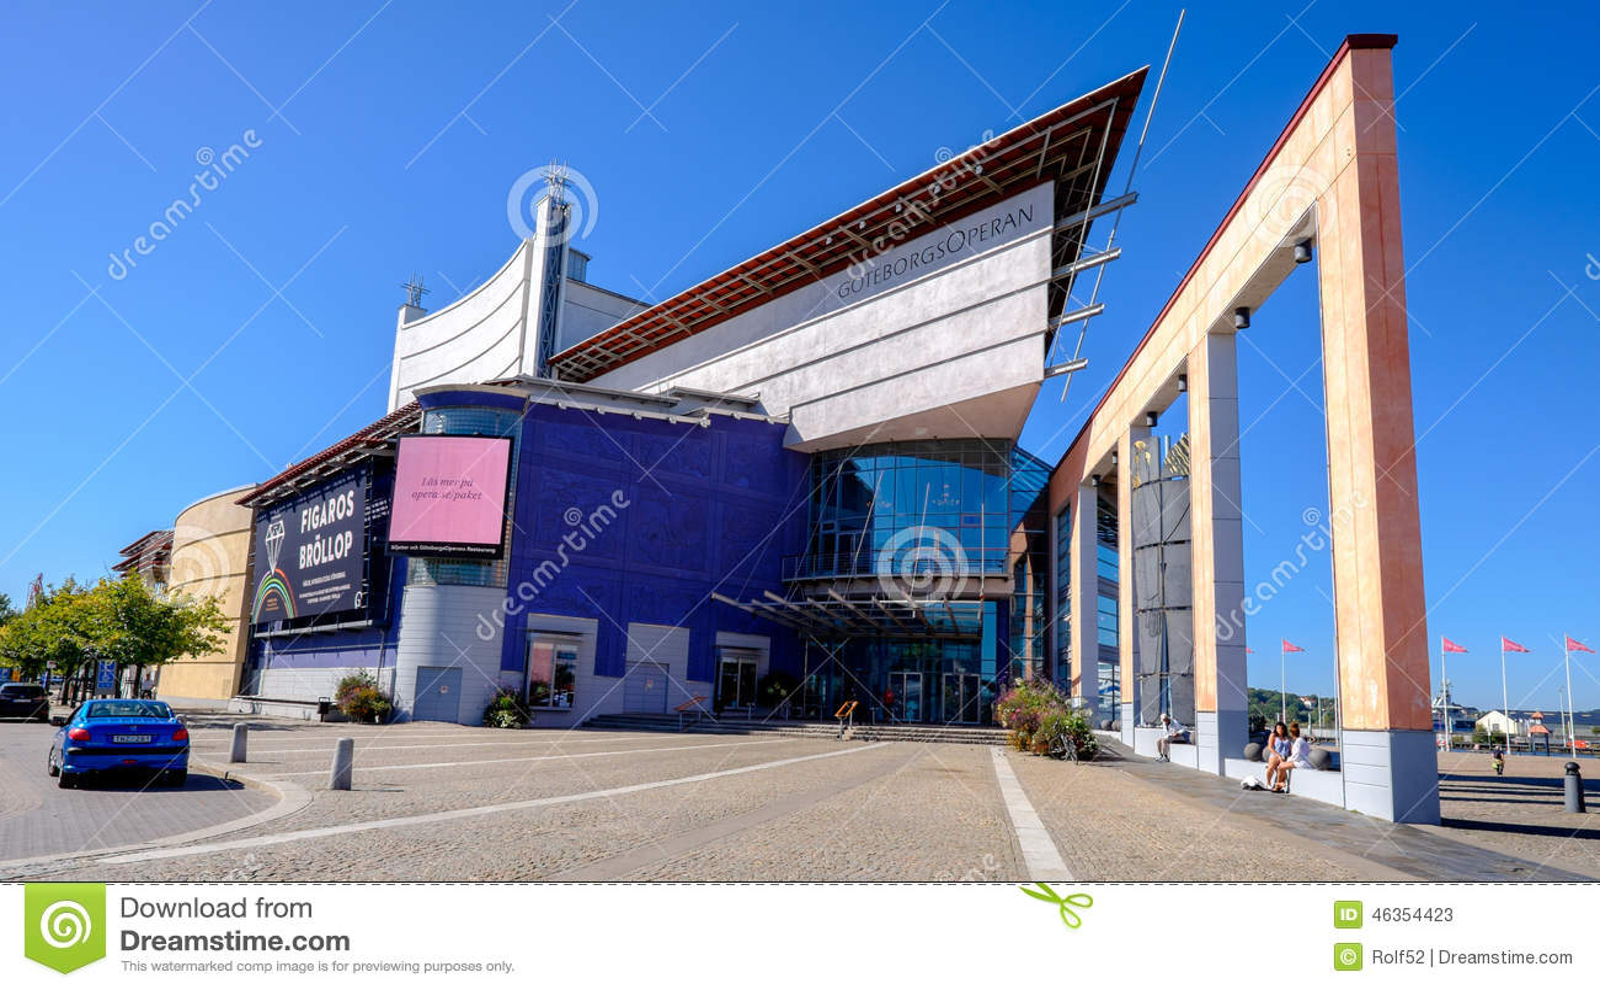 4290329975de Gothenburg Opera House editorial stock photo. Image of culture ...